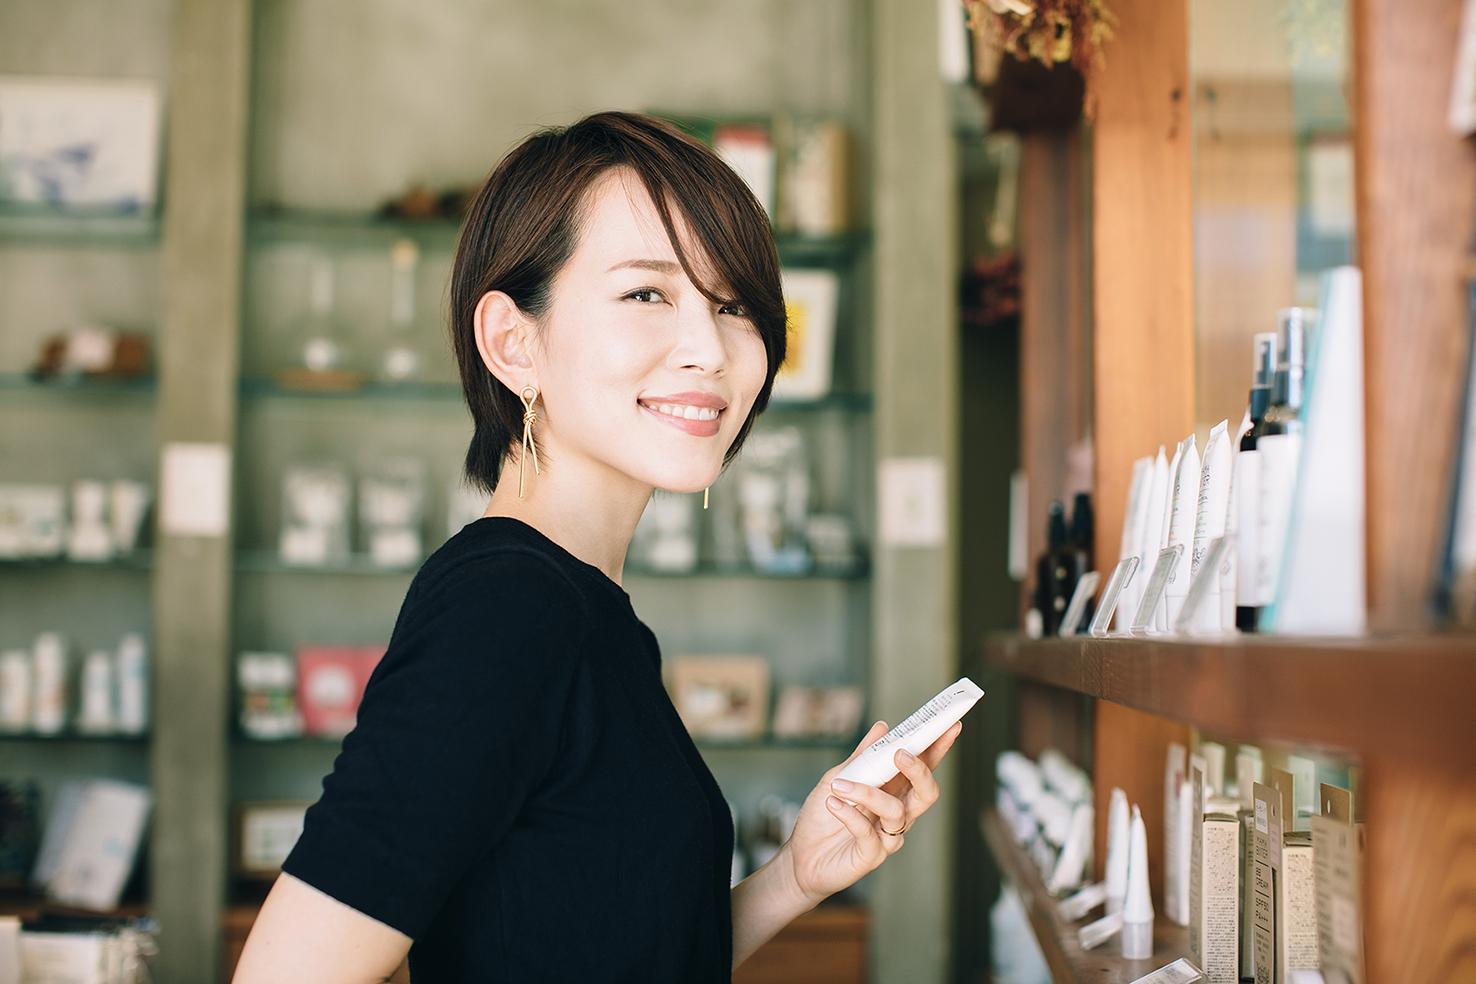 Saori Motojima – beauty expert